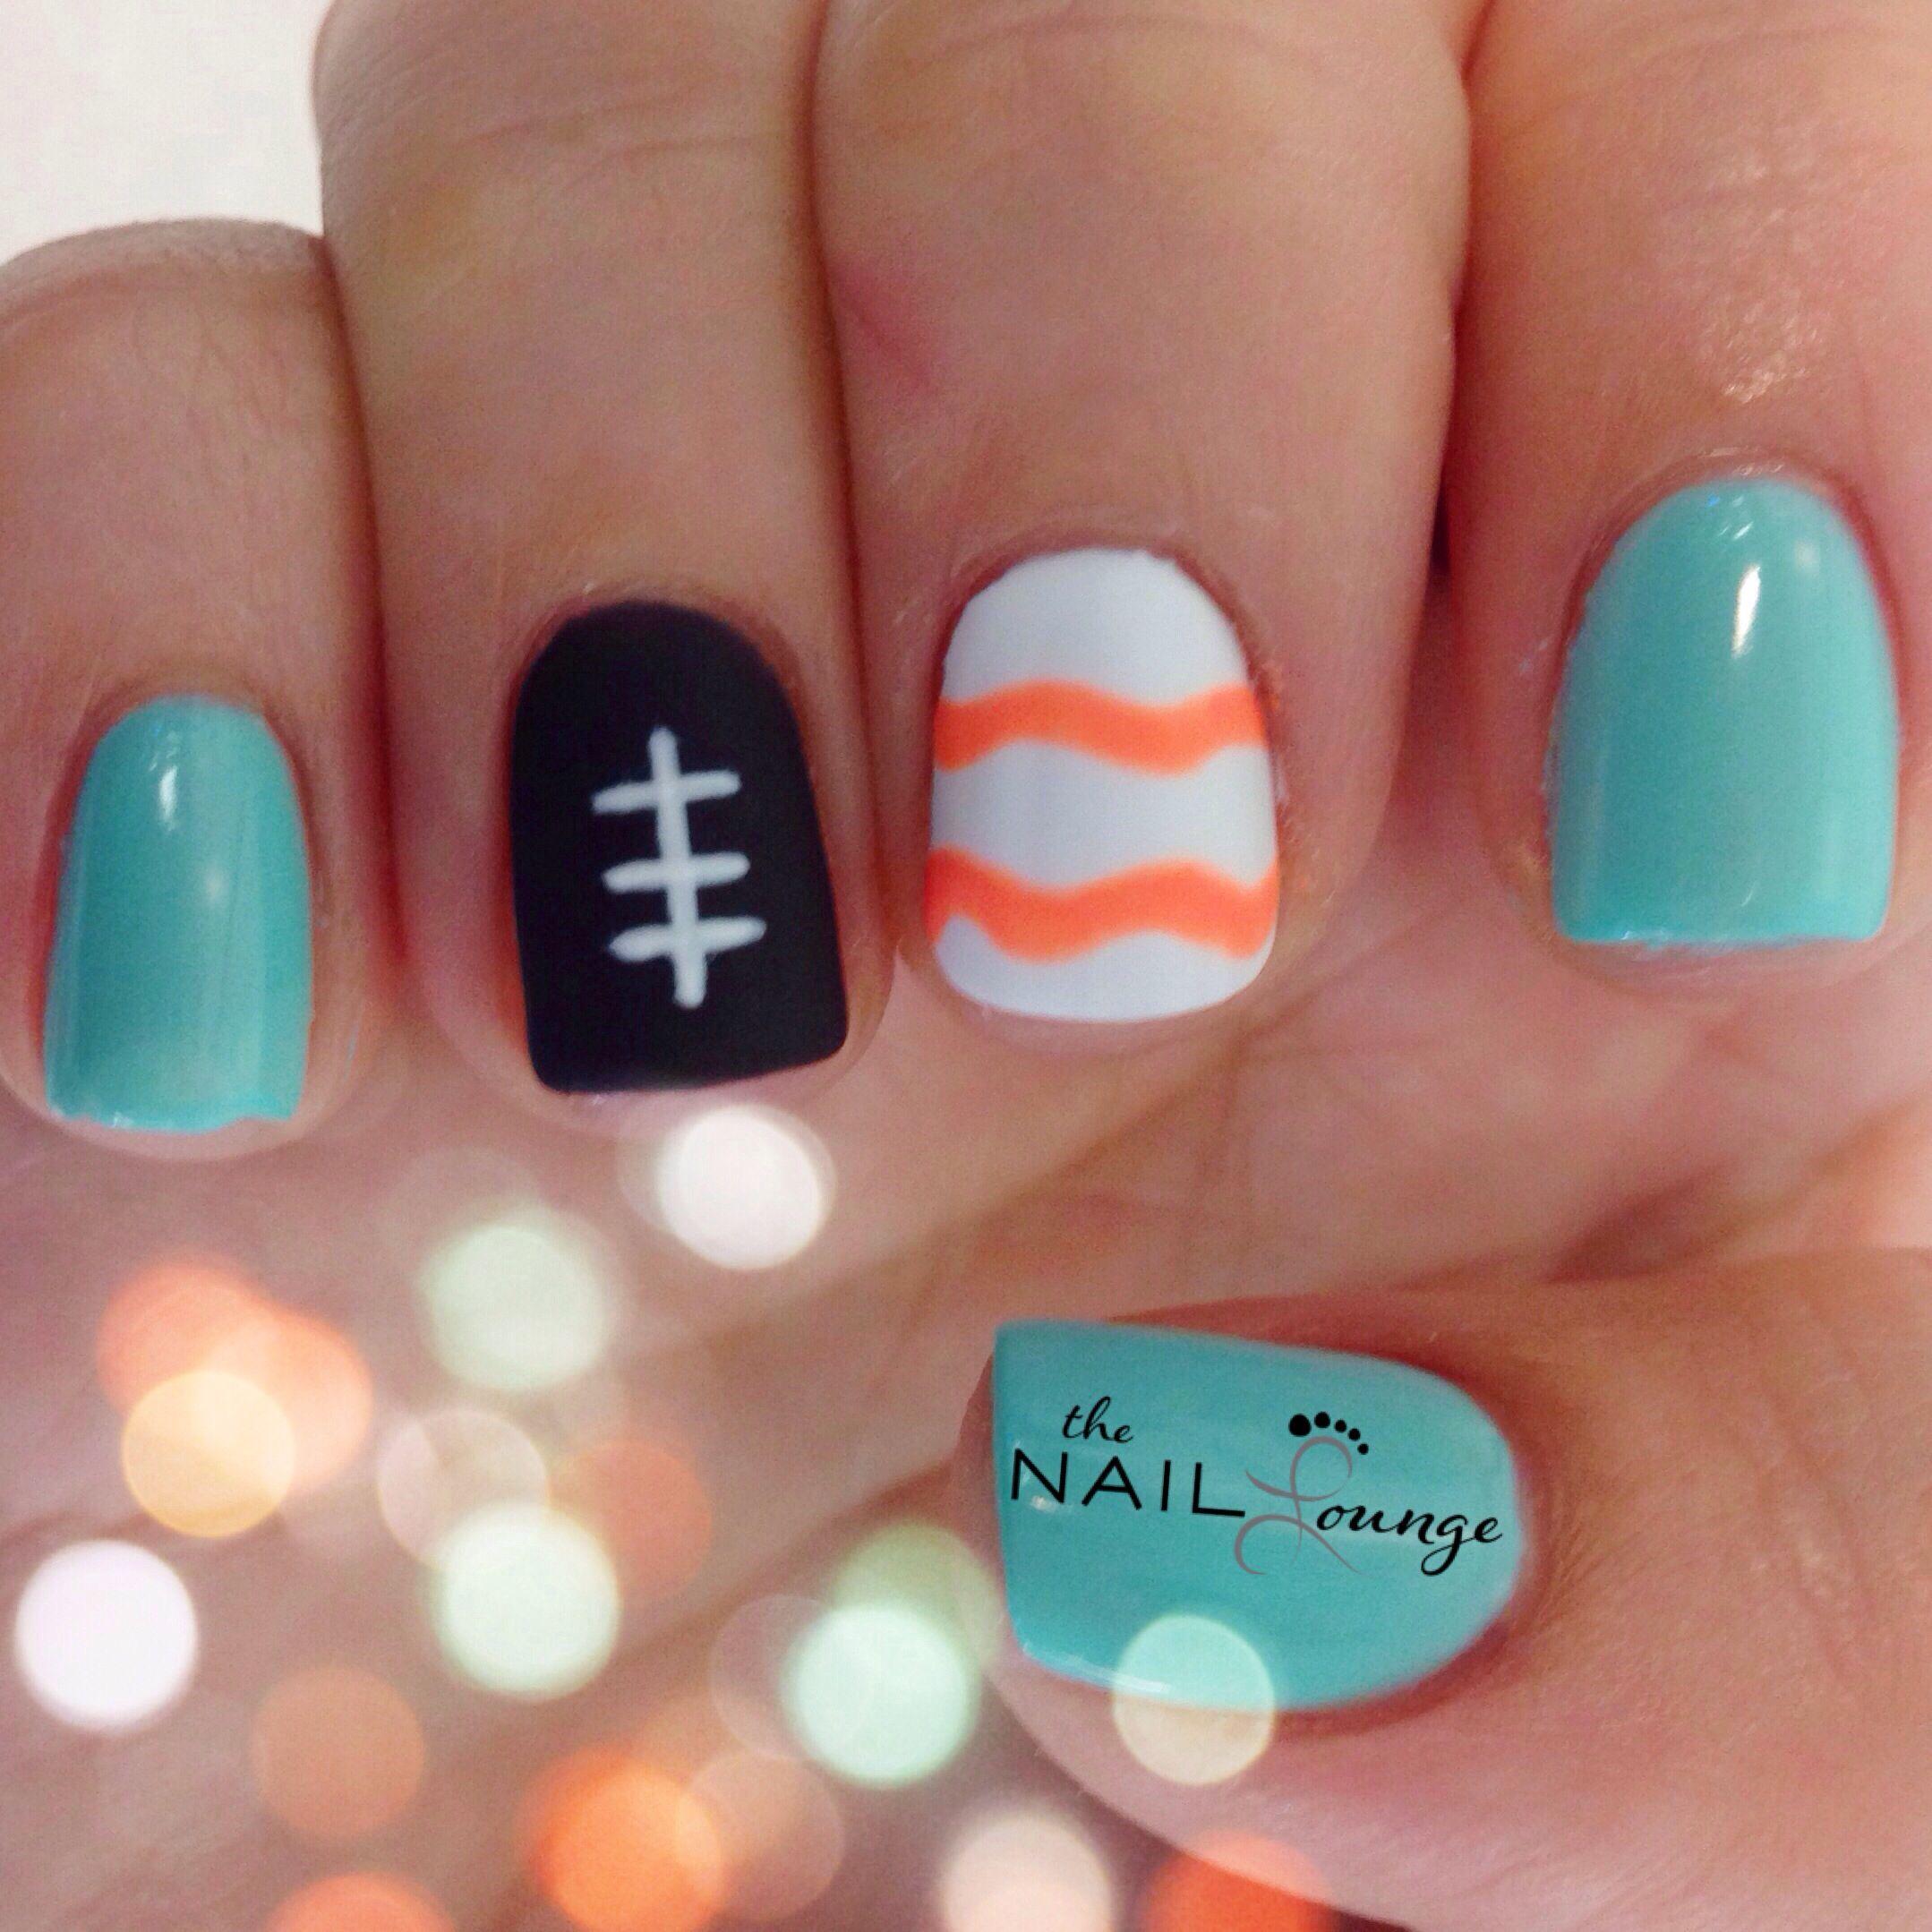 Miami dolphins gel nail art | Belleza | Pinterest | Manicuras, Uña ...